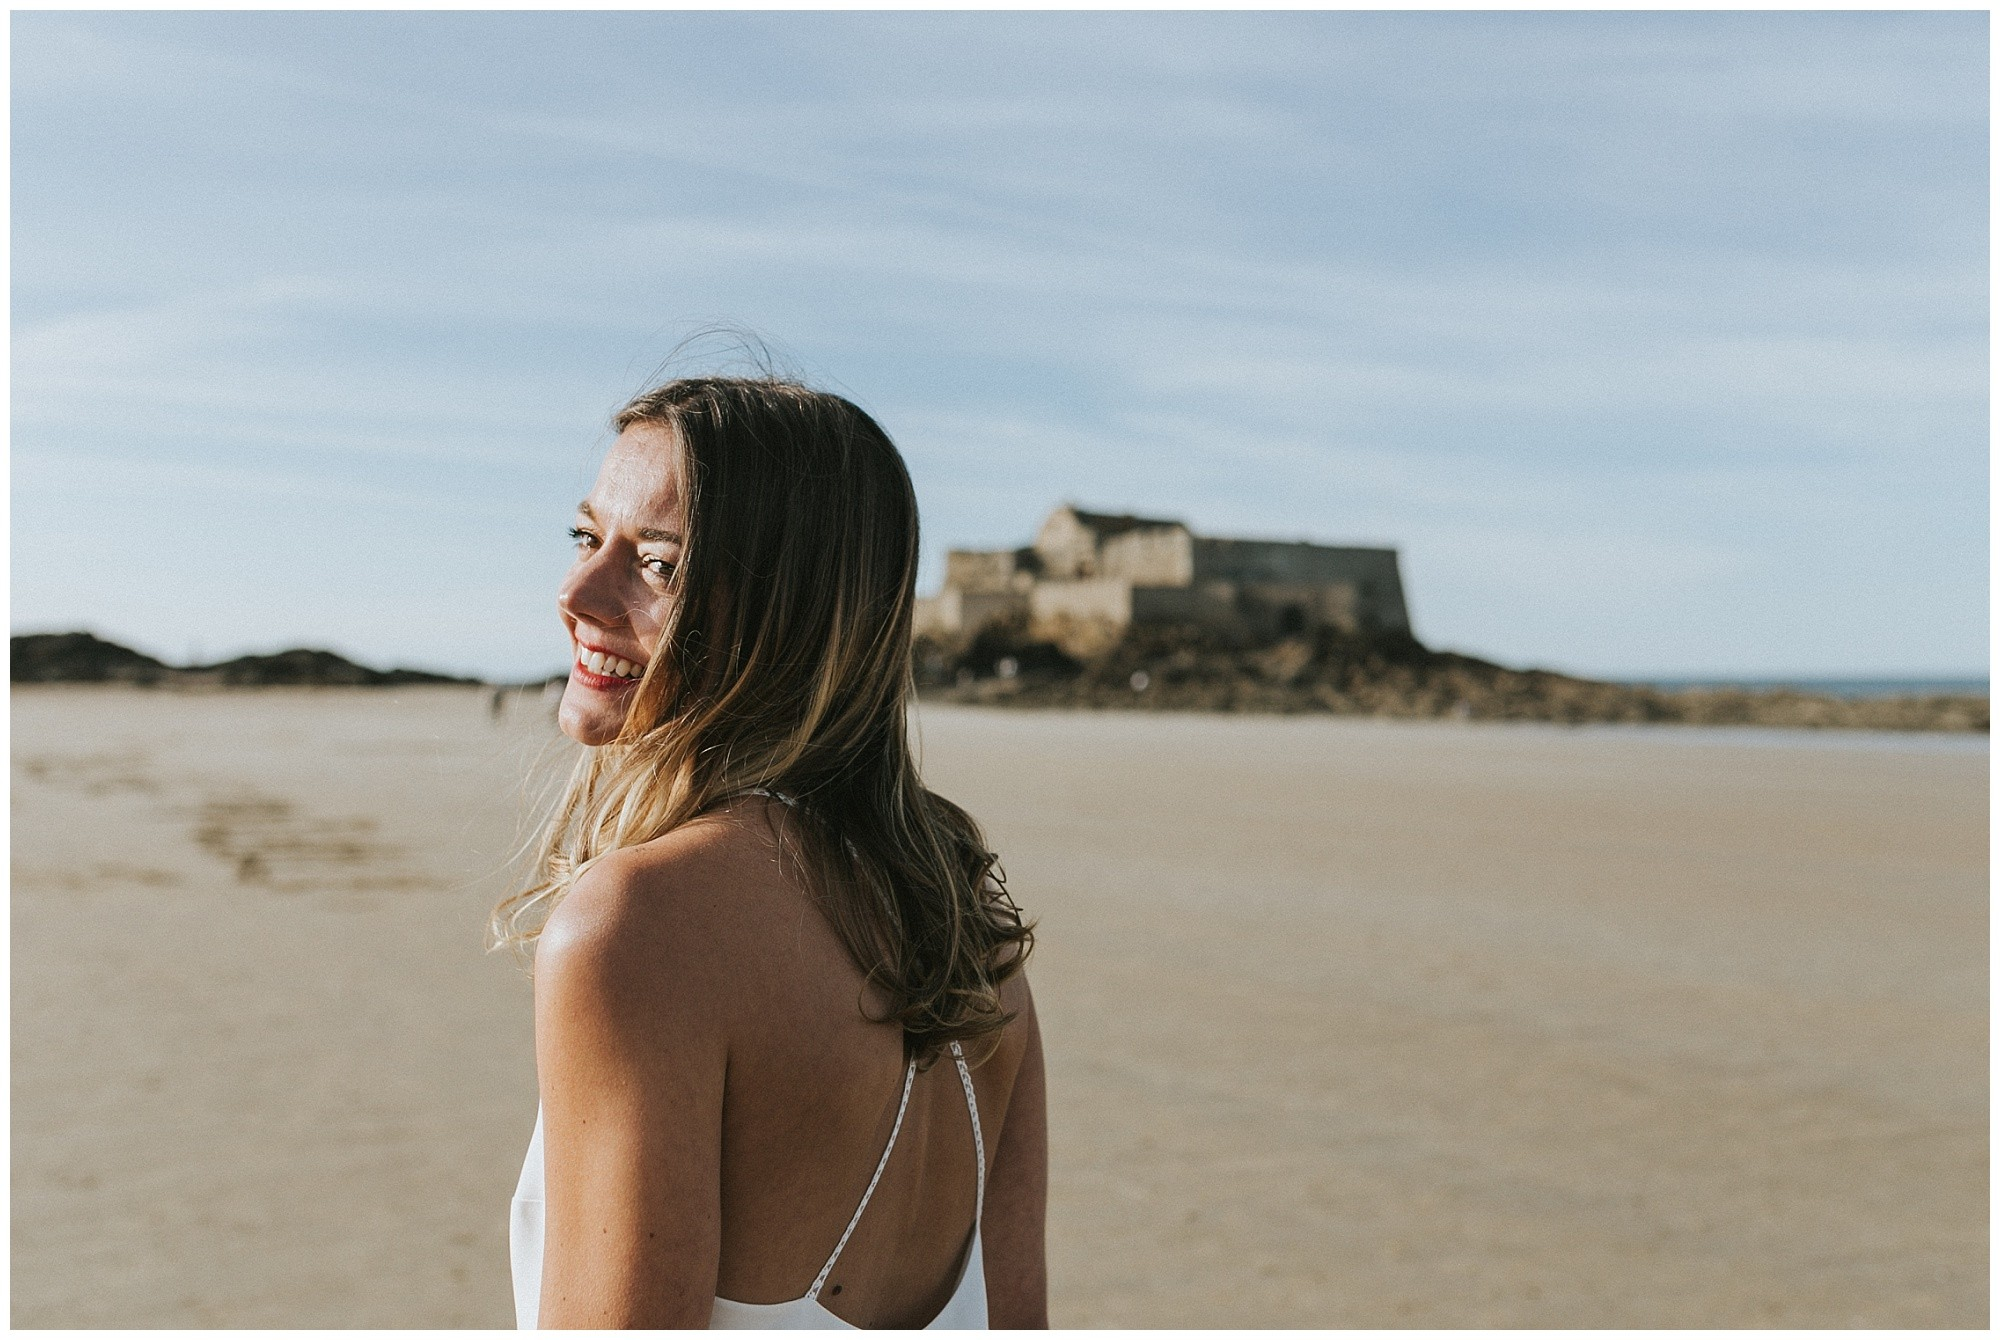 Kateryna-photos-photographe-mariage-bretagne-saint-malo-finistere-cotes-darmor-wedding_0062.jpg